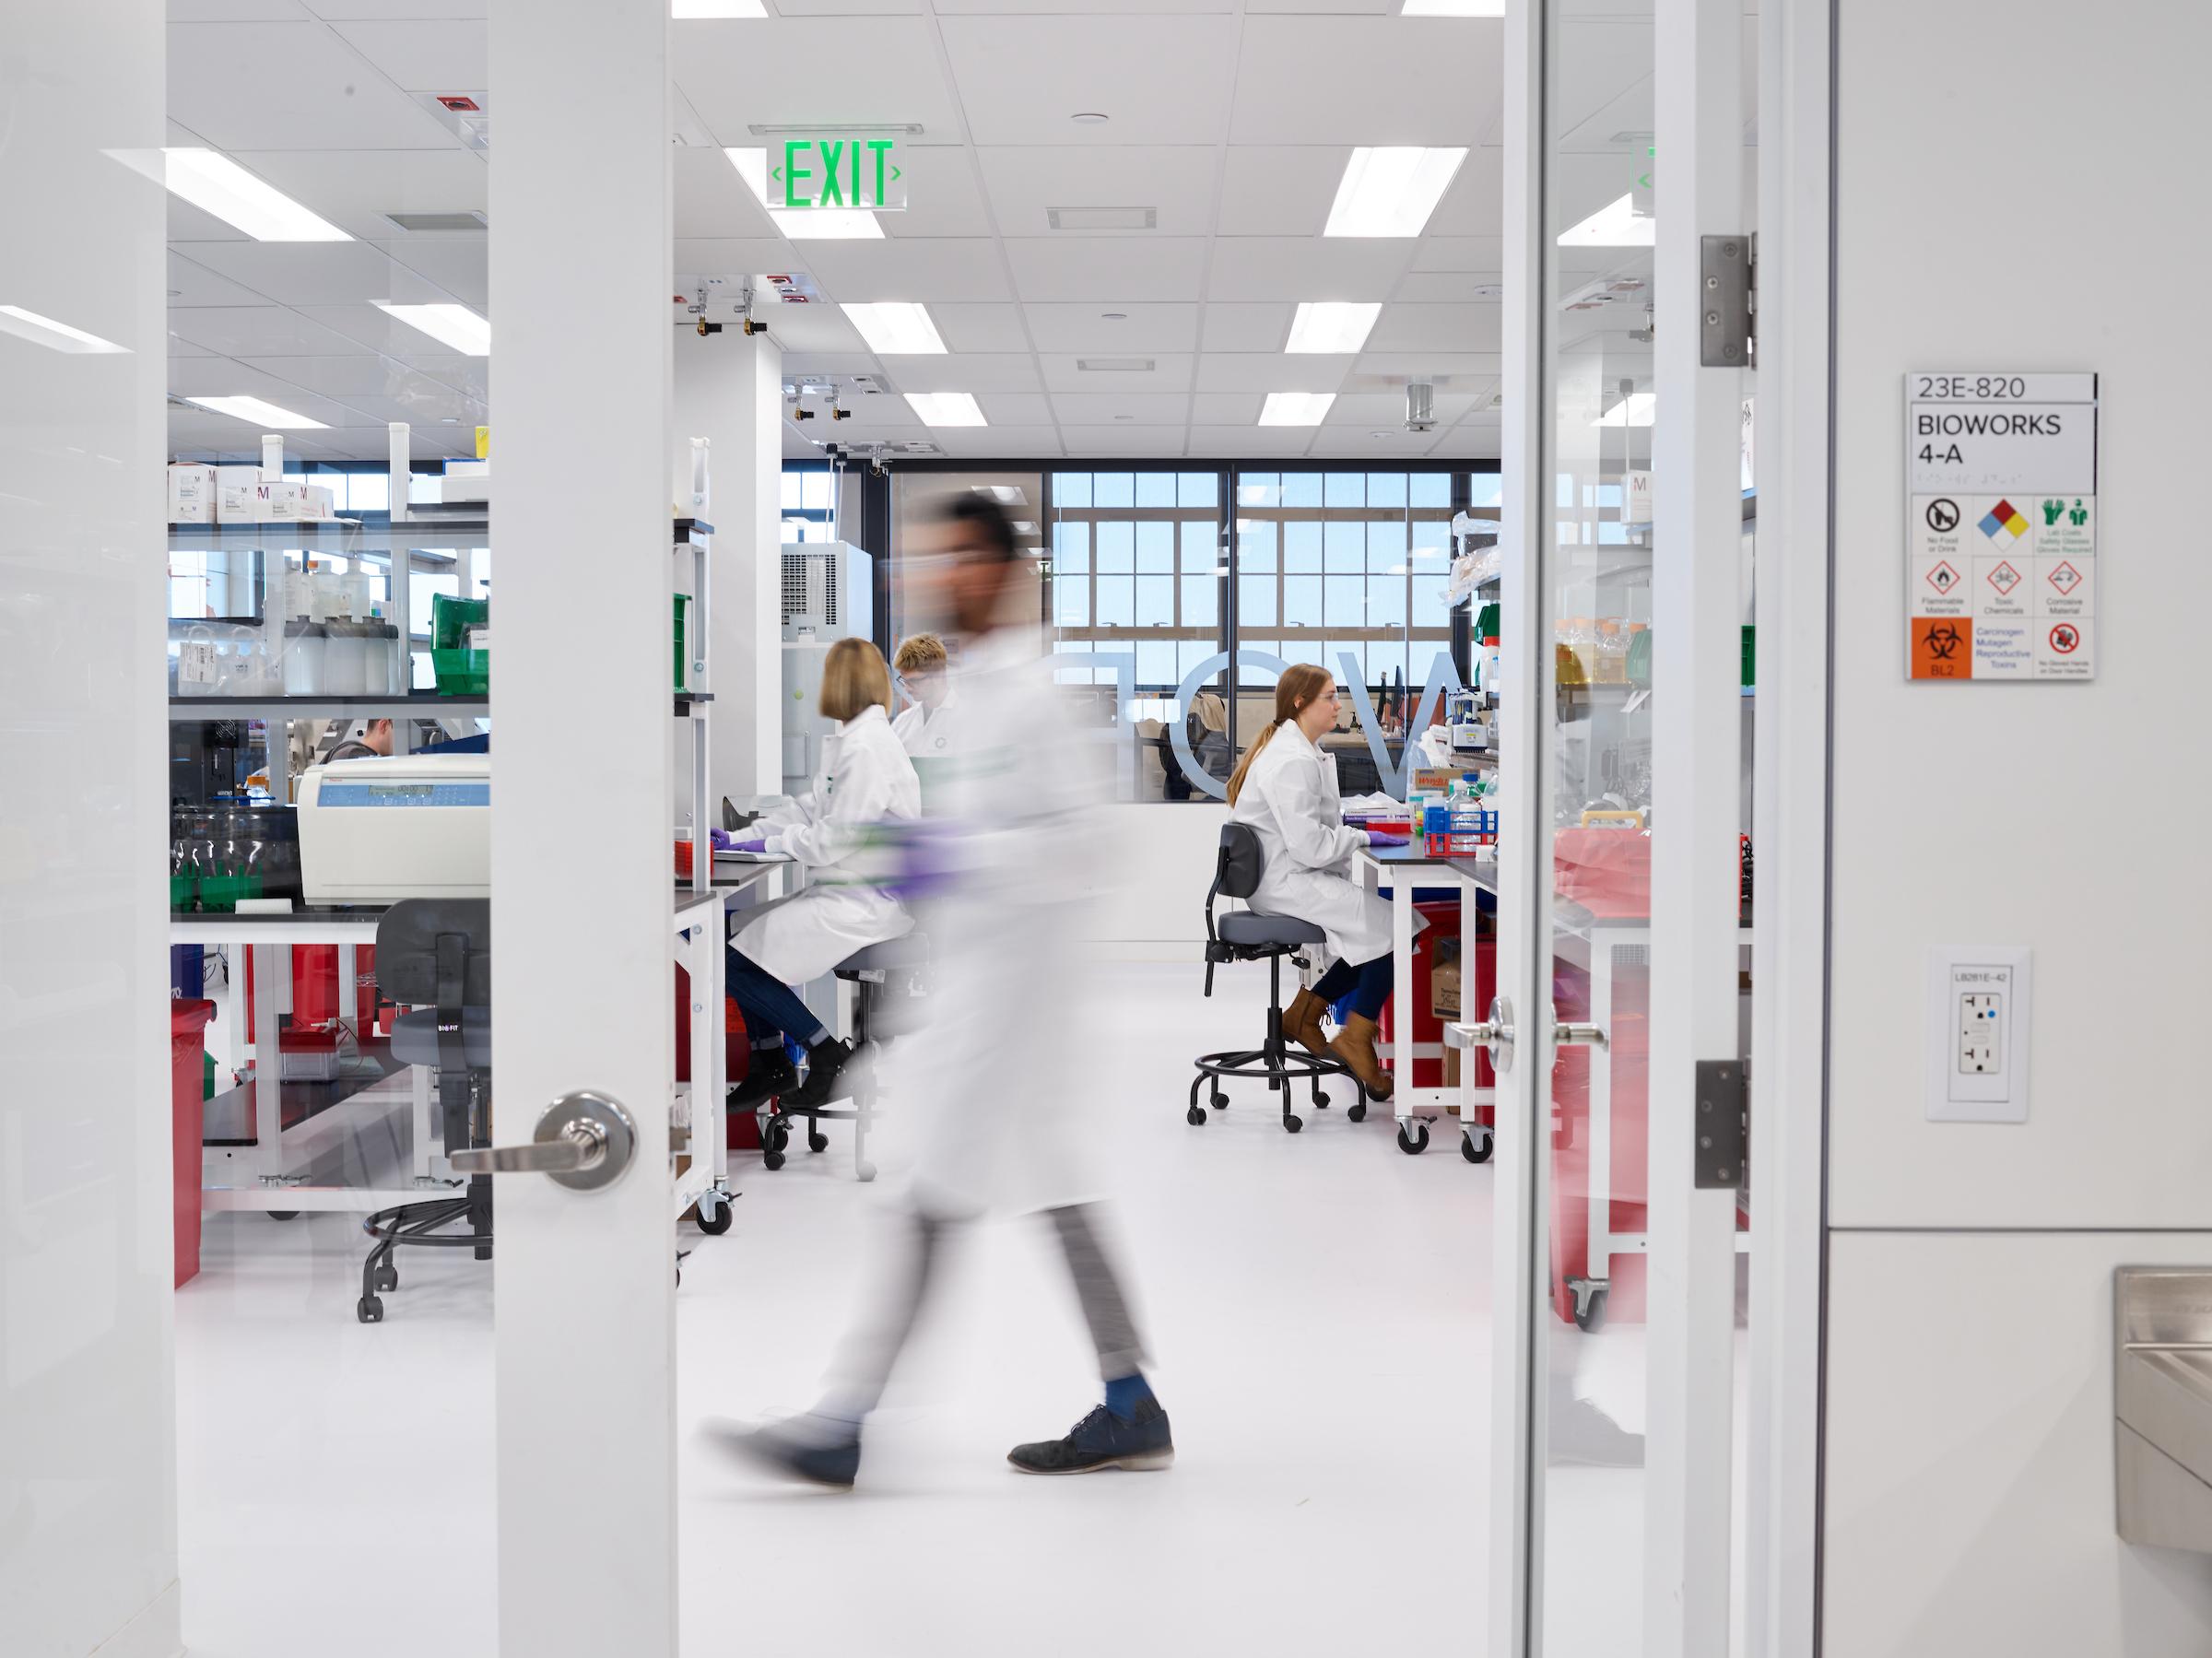 photograph showing a lab at Gingko Bioworks